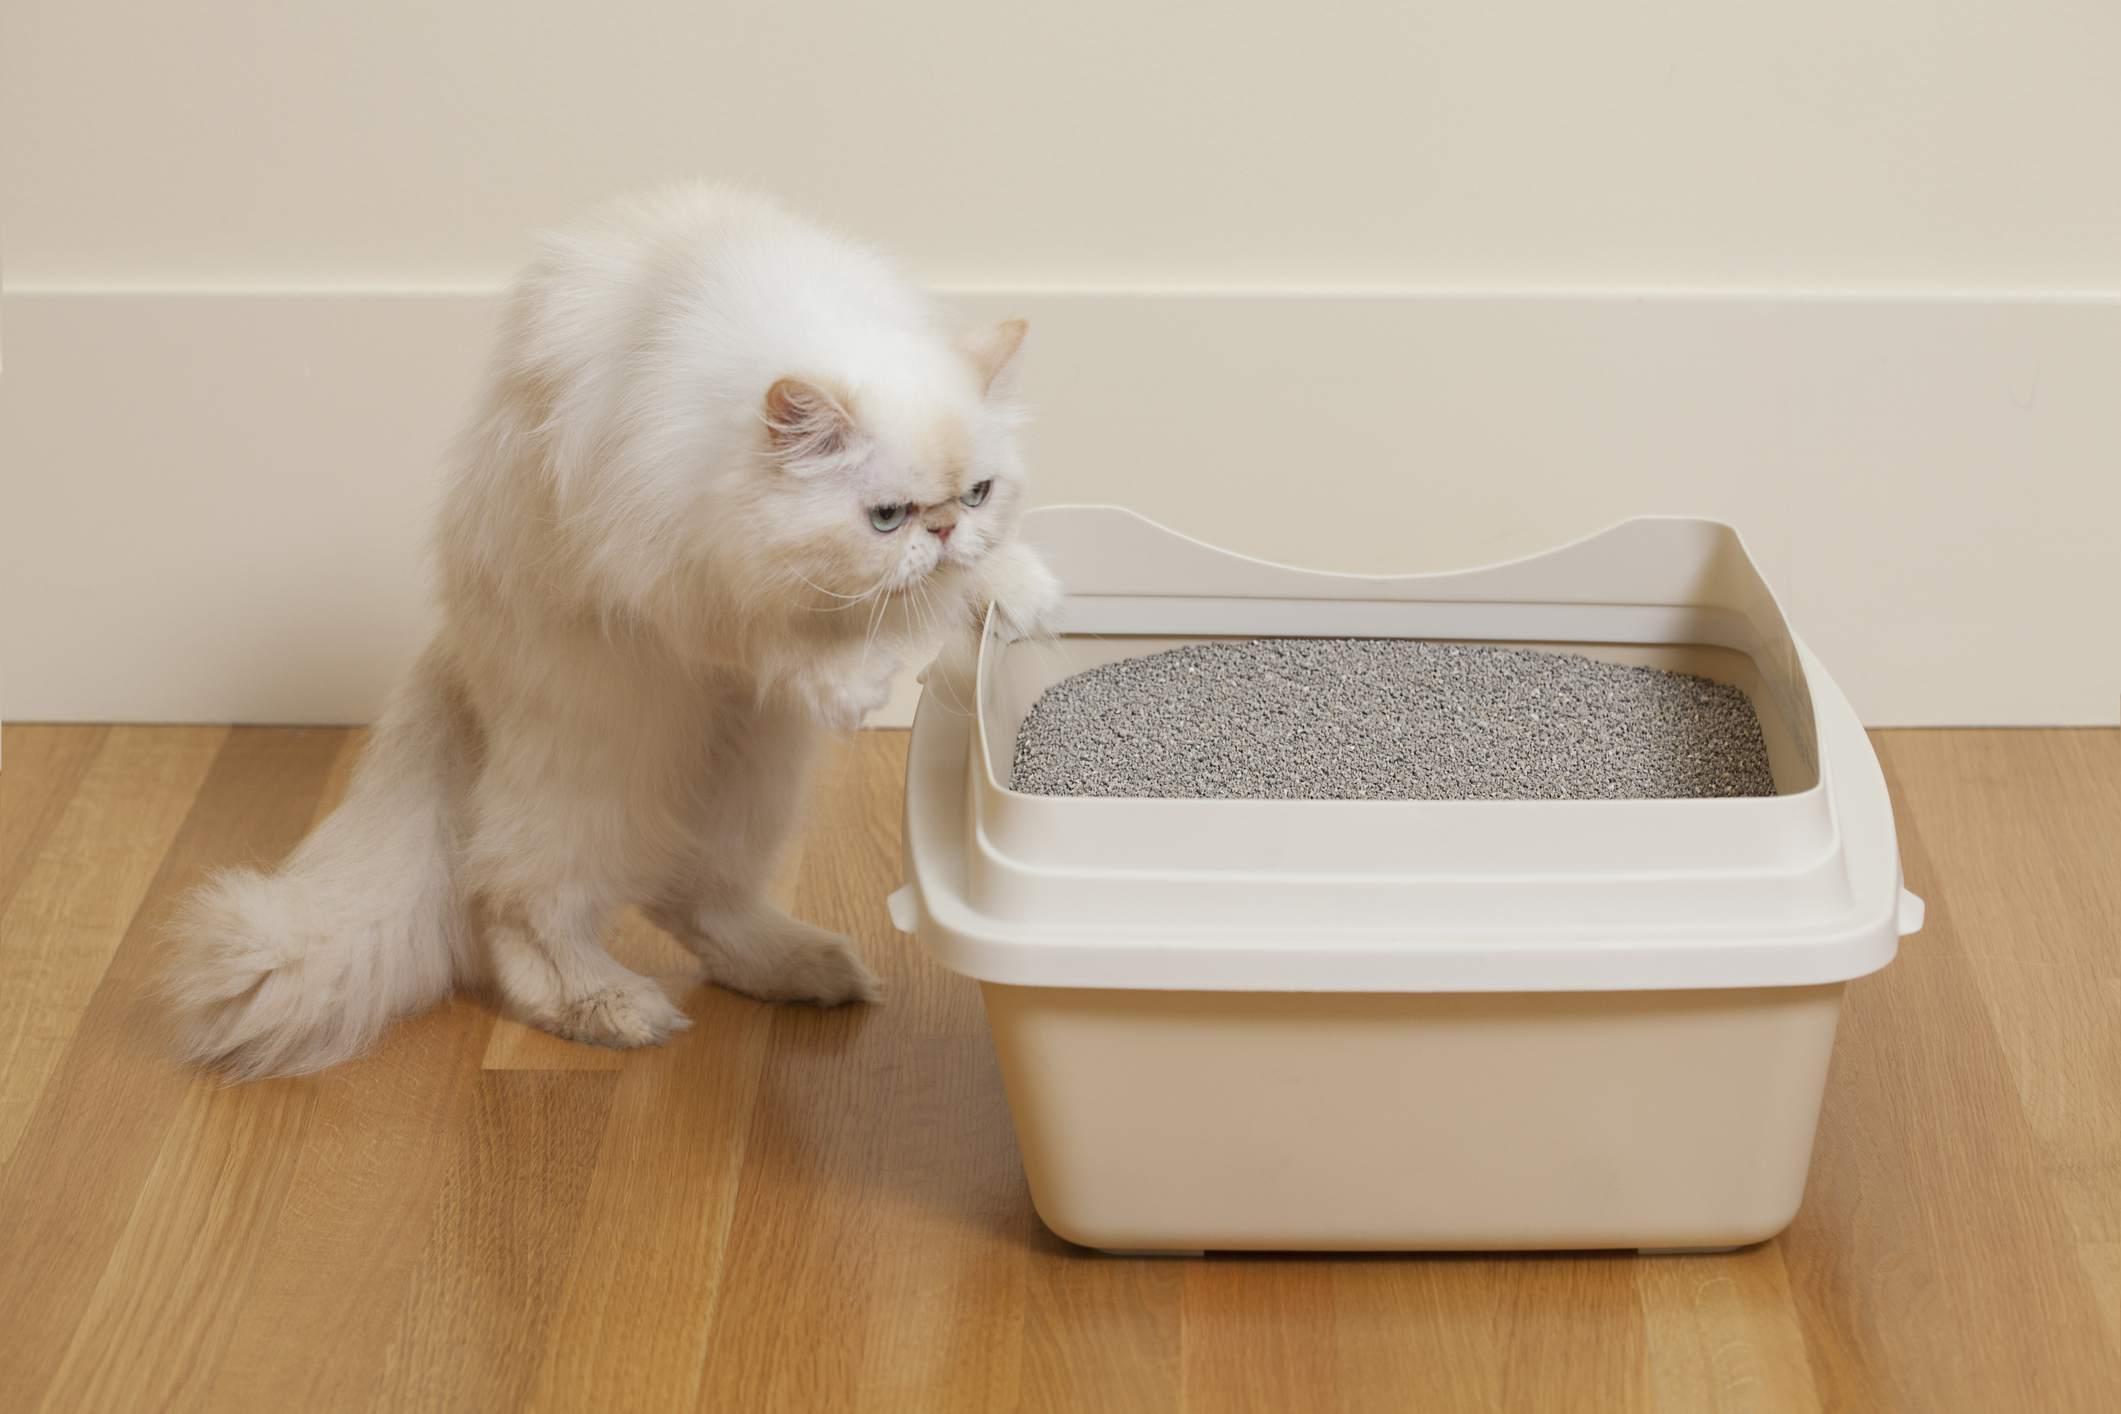 White Persian cat approaching a litter box.